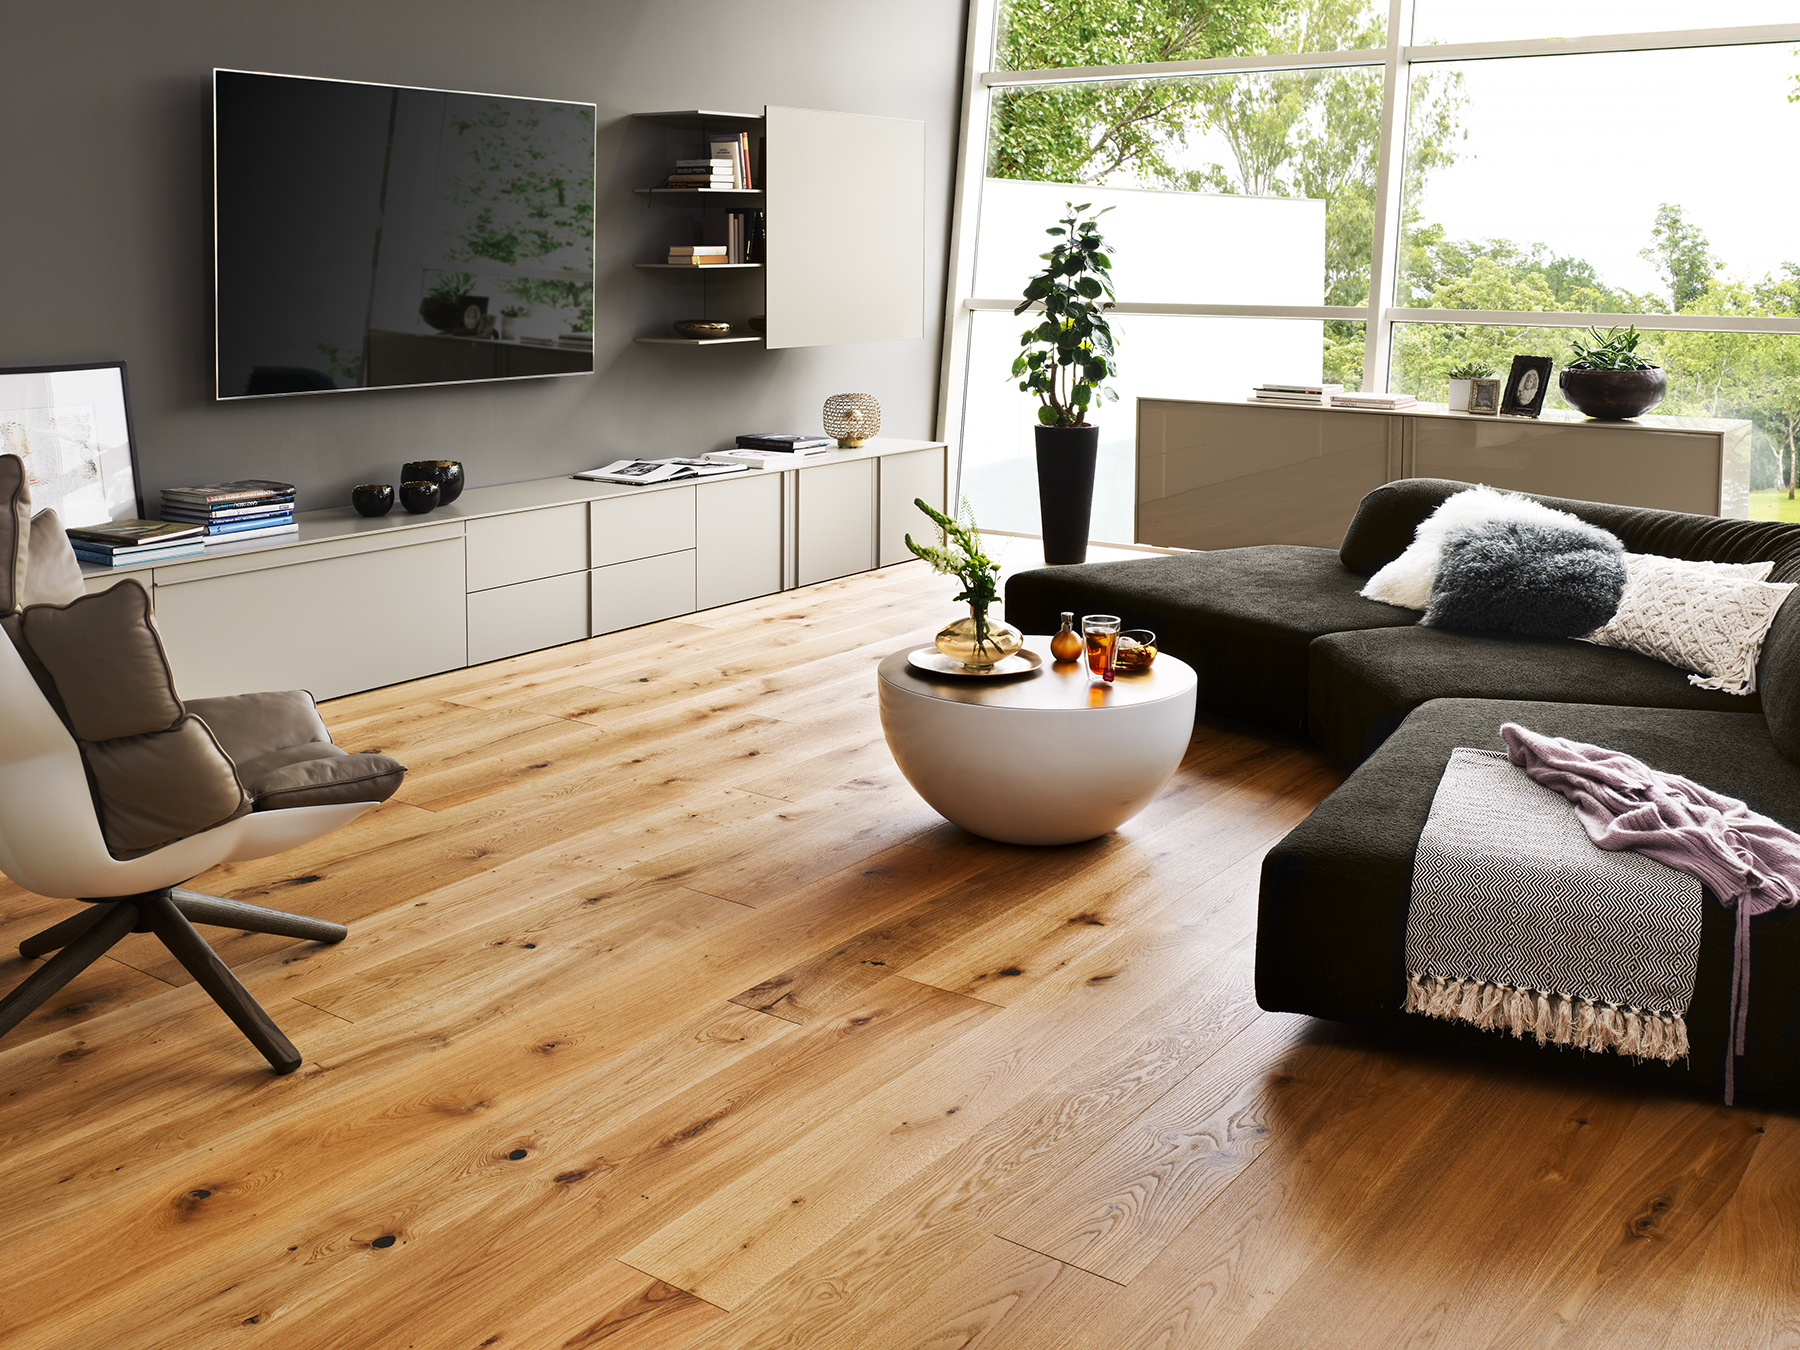 528682 haro parkett landhausdiele 4000 eiche markant natur. Black Bedroom Furniture Sets. Home Design Ideas